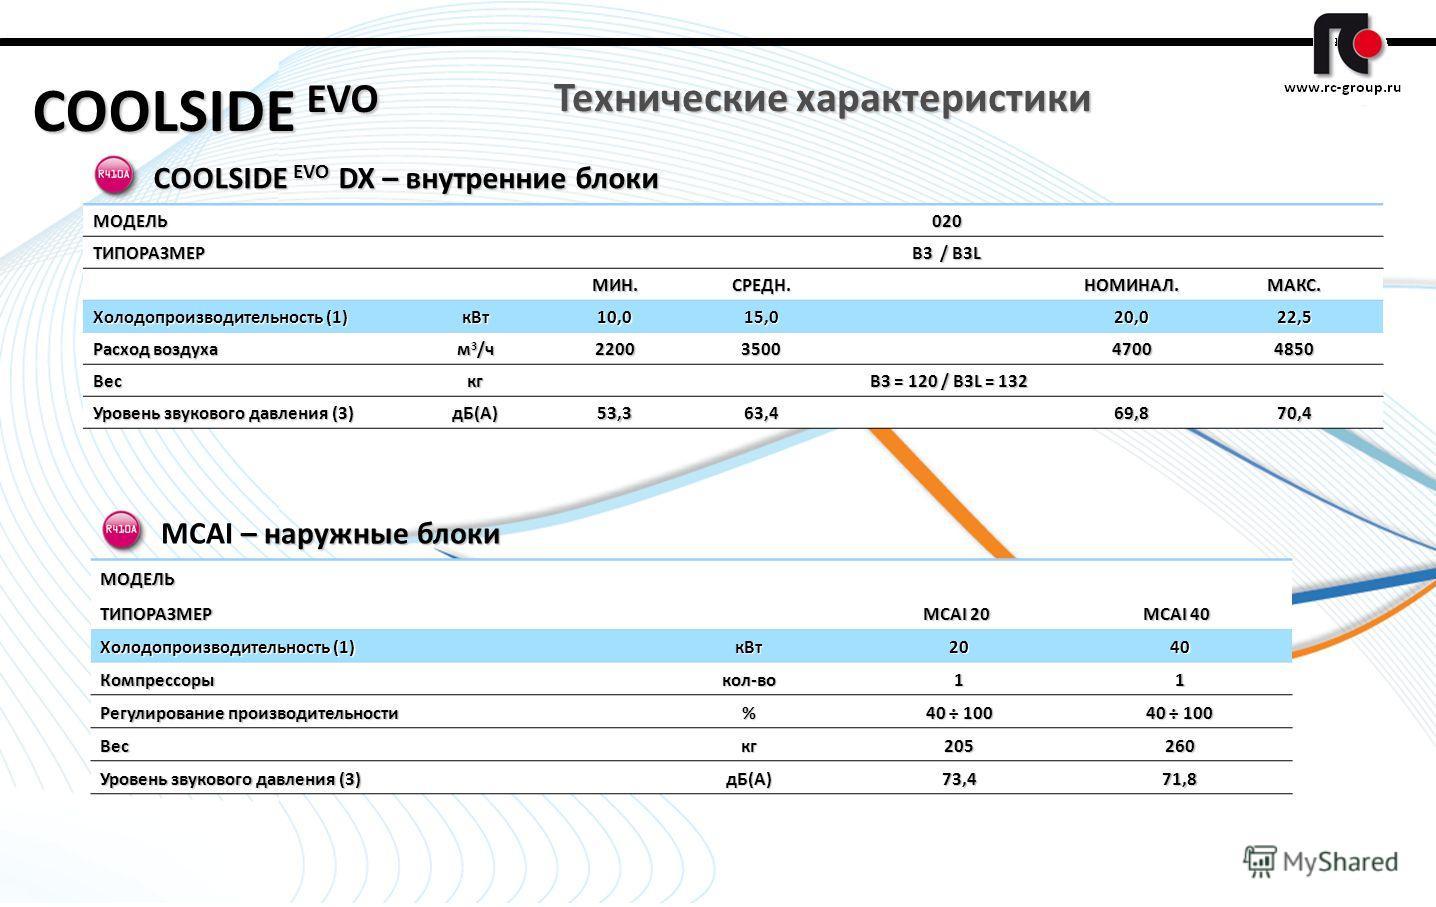 1 COOLSIDE EVO МОДЕЛЬ 020 ТИПОРАЗМЕР В3 / B3L МИН.СРЕДН. НОМИНАЛ.МАКС. Холодопроизводительность (1) кВт10,015,0 20,022,5 Расход воздуха м 3 /ч 22003500 47004850 Вескг В3 = 120 / B3L = 132 В3 = 120 / B3L = 132 Уровень звукового давления (3) дБ(А)53,36